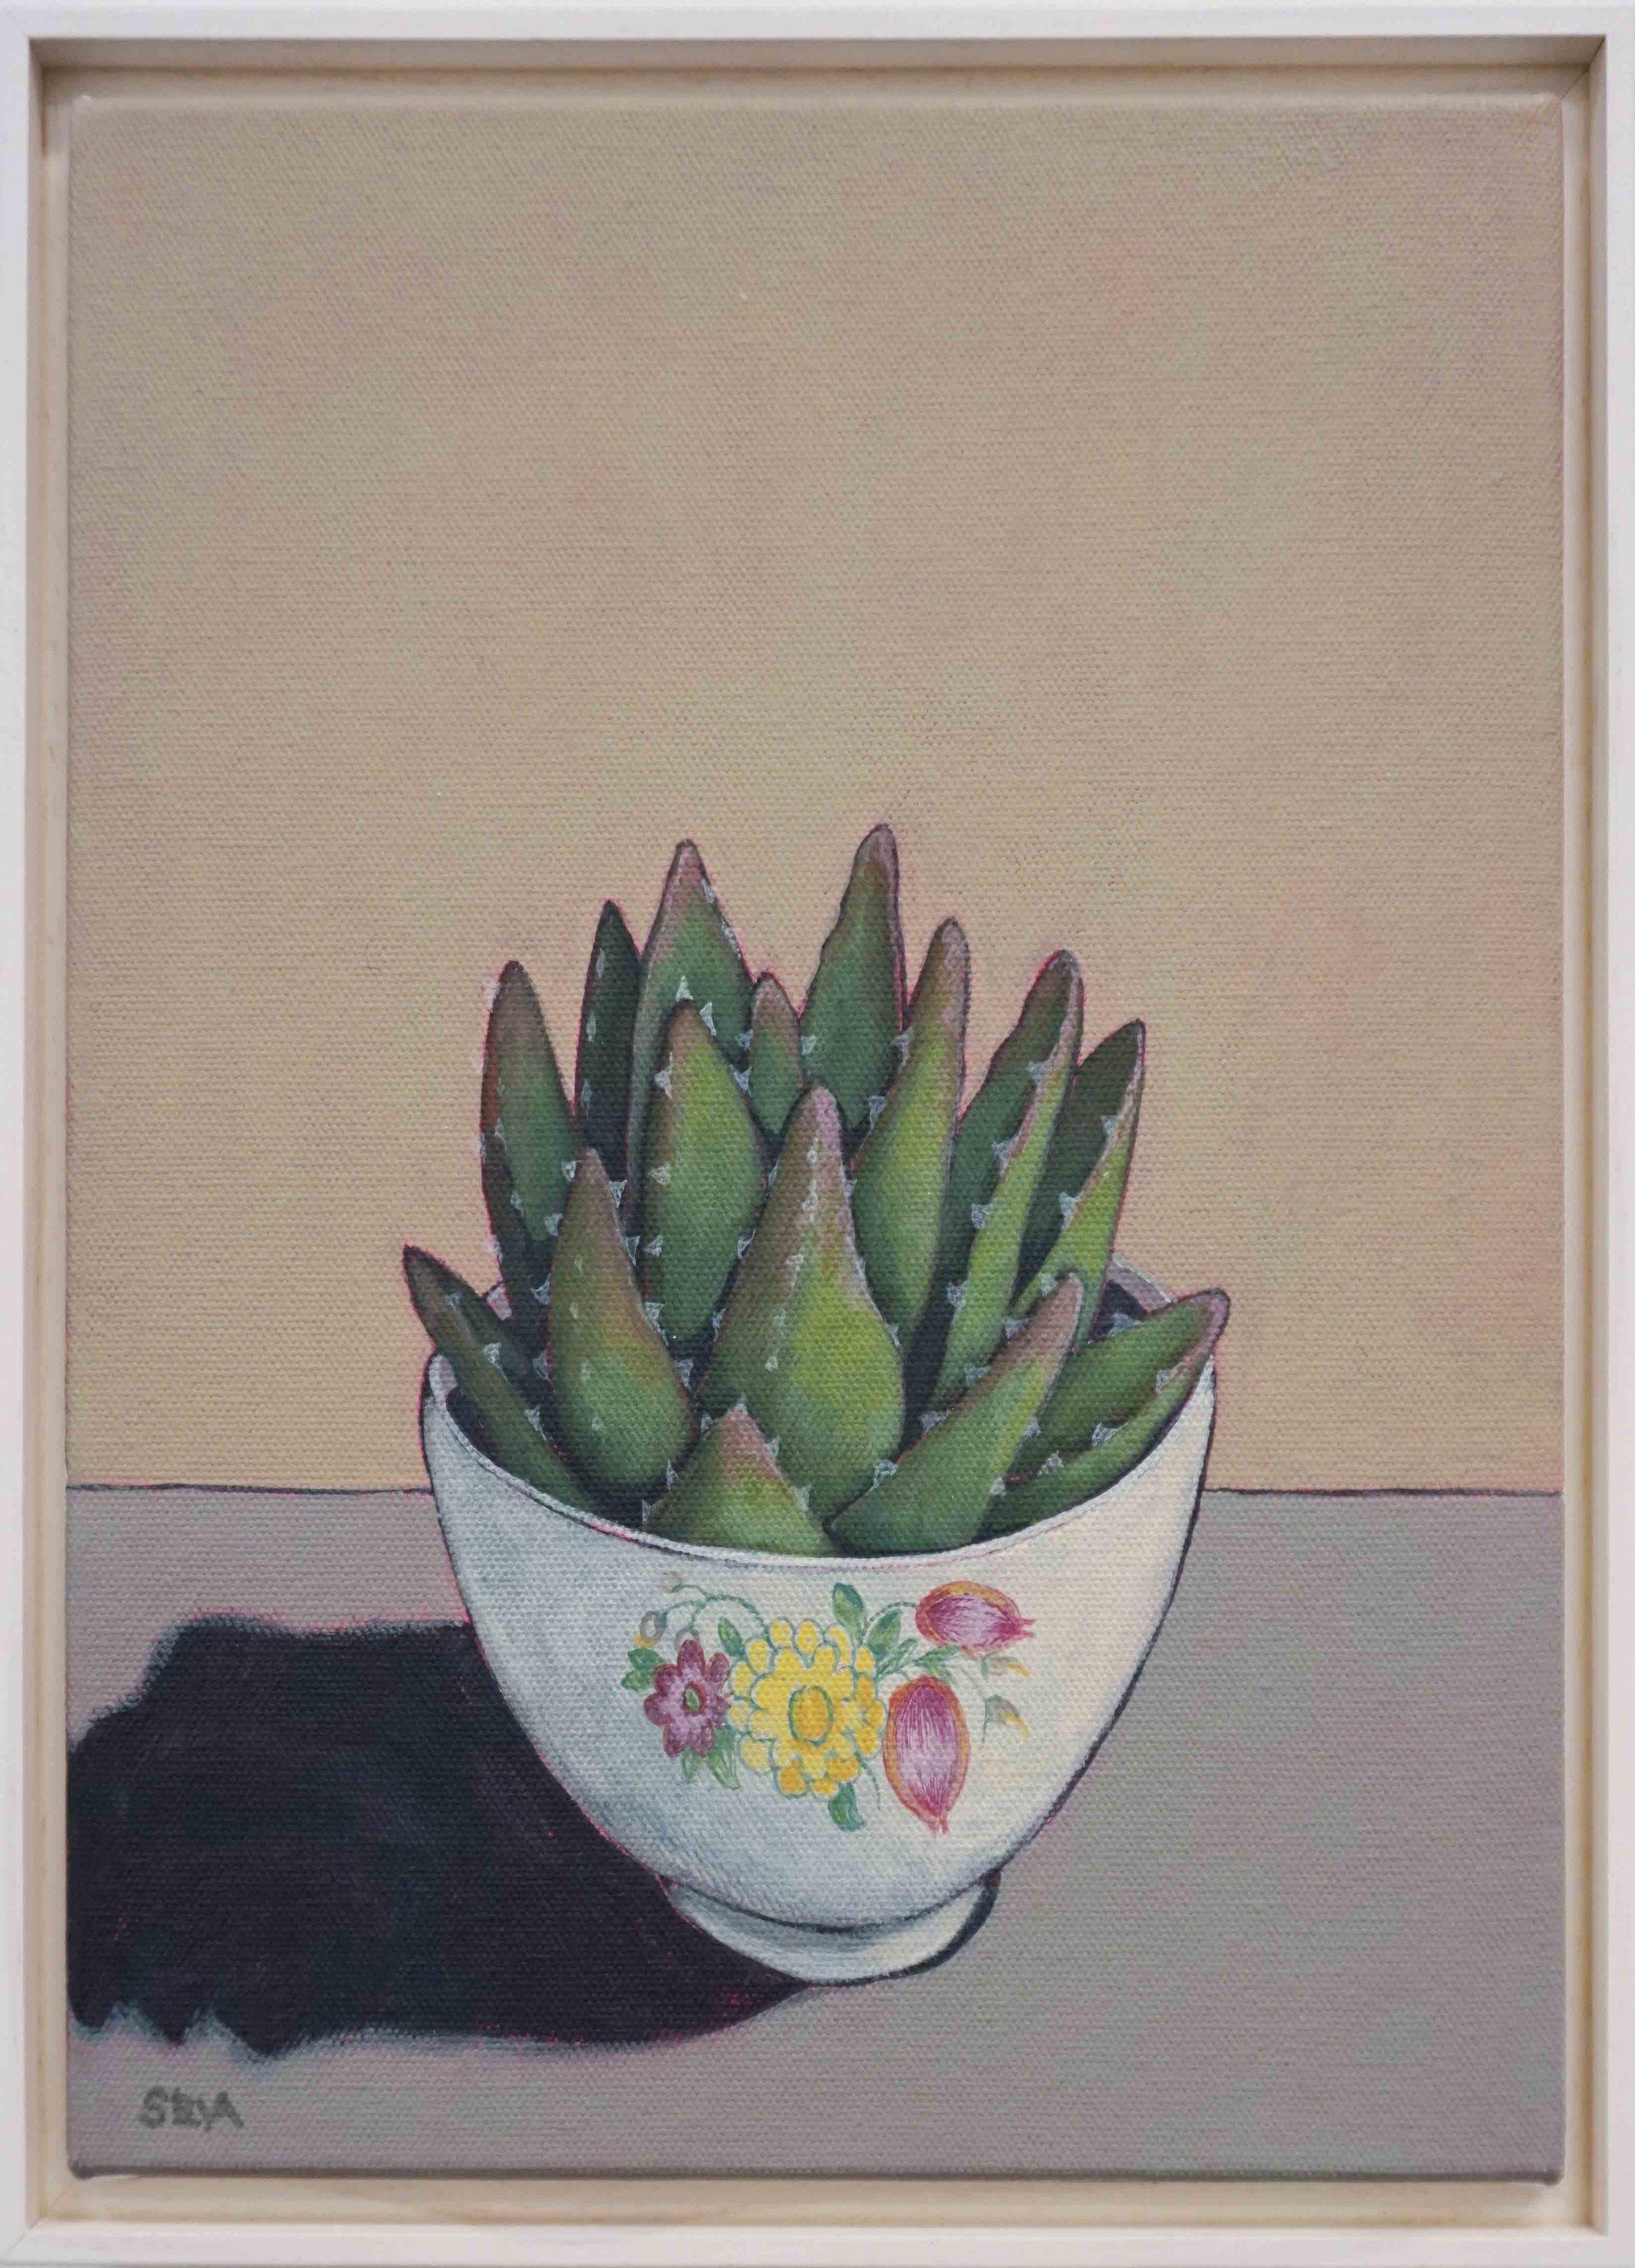 9. Sue Eva, 'Susie Cooper and Aloe', 2018, Acrylic on canvas, 30 x 25cm, $345